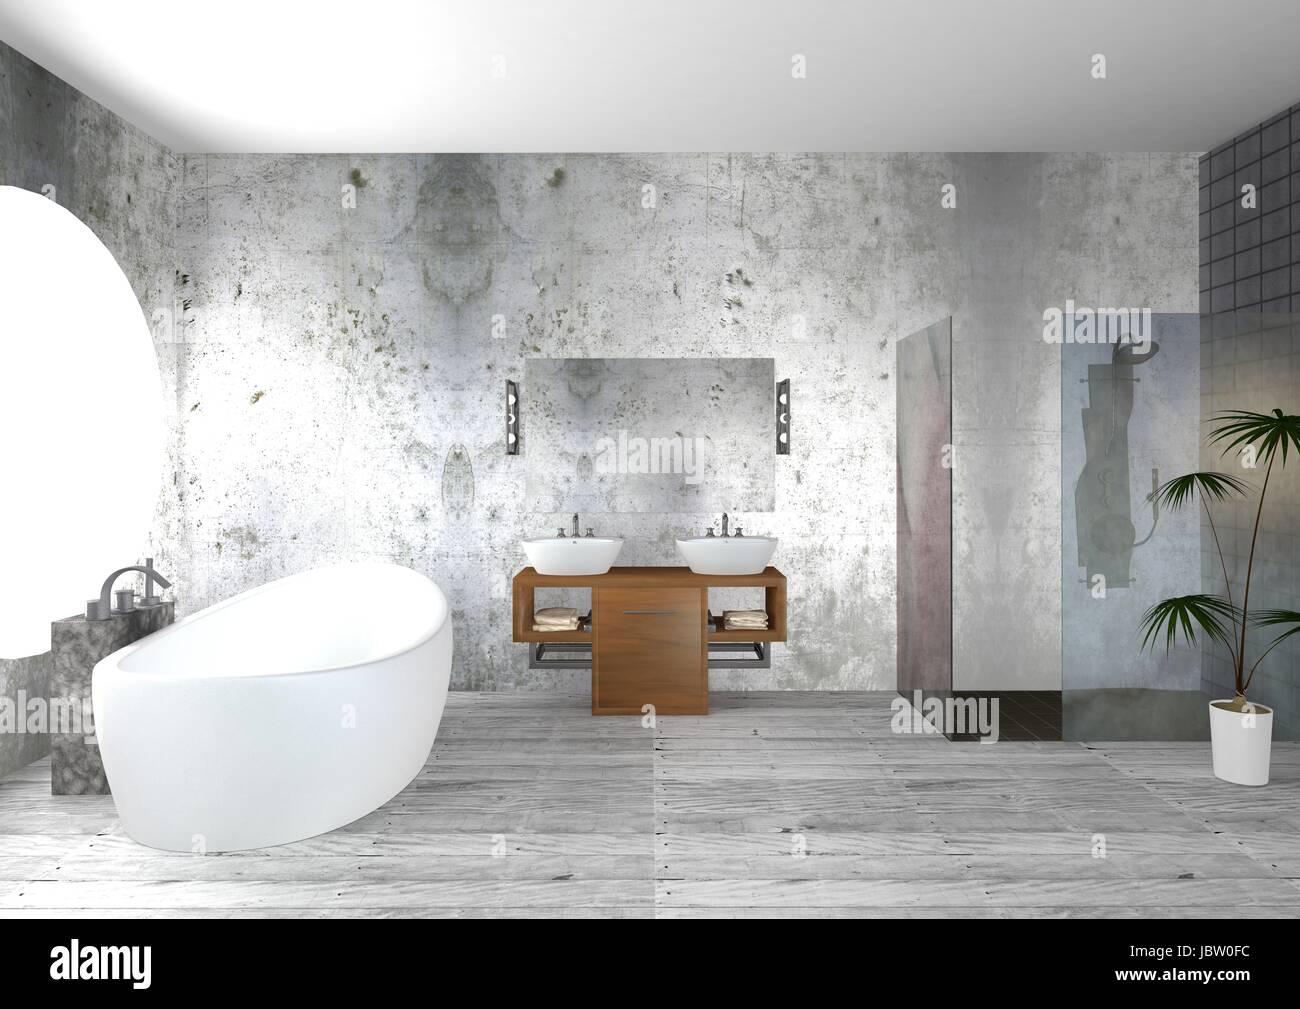 Bad Design Stock Photo: 144993392 - Alamy